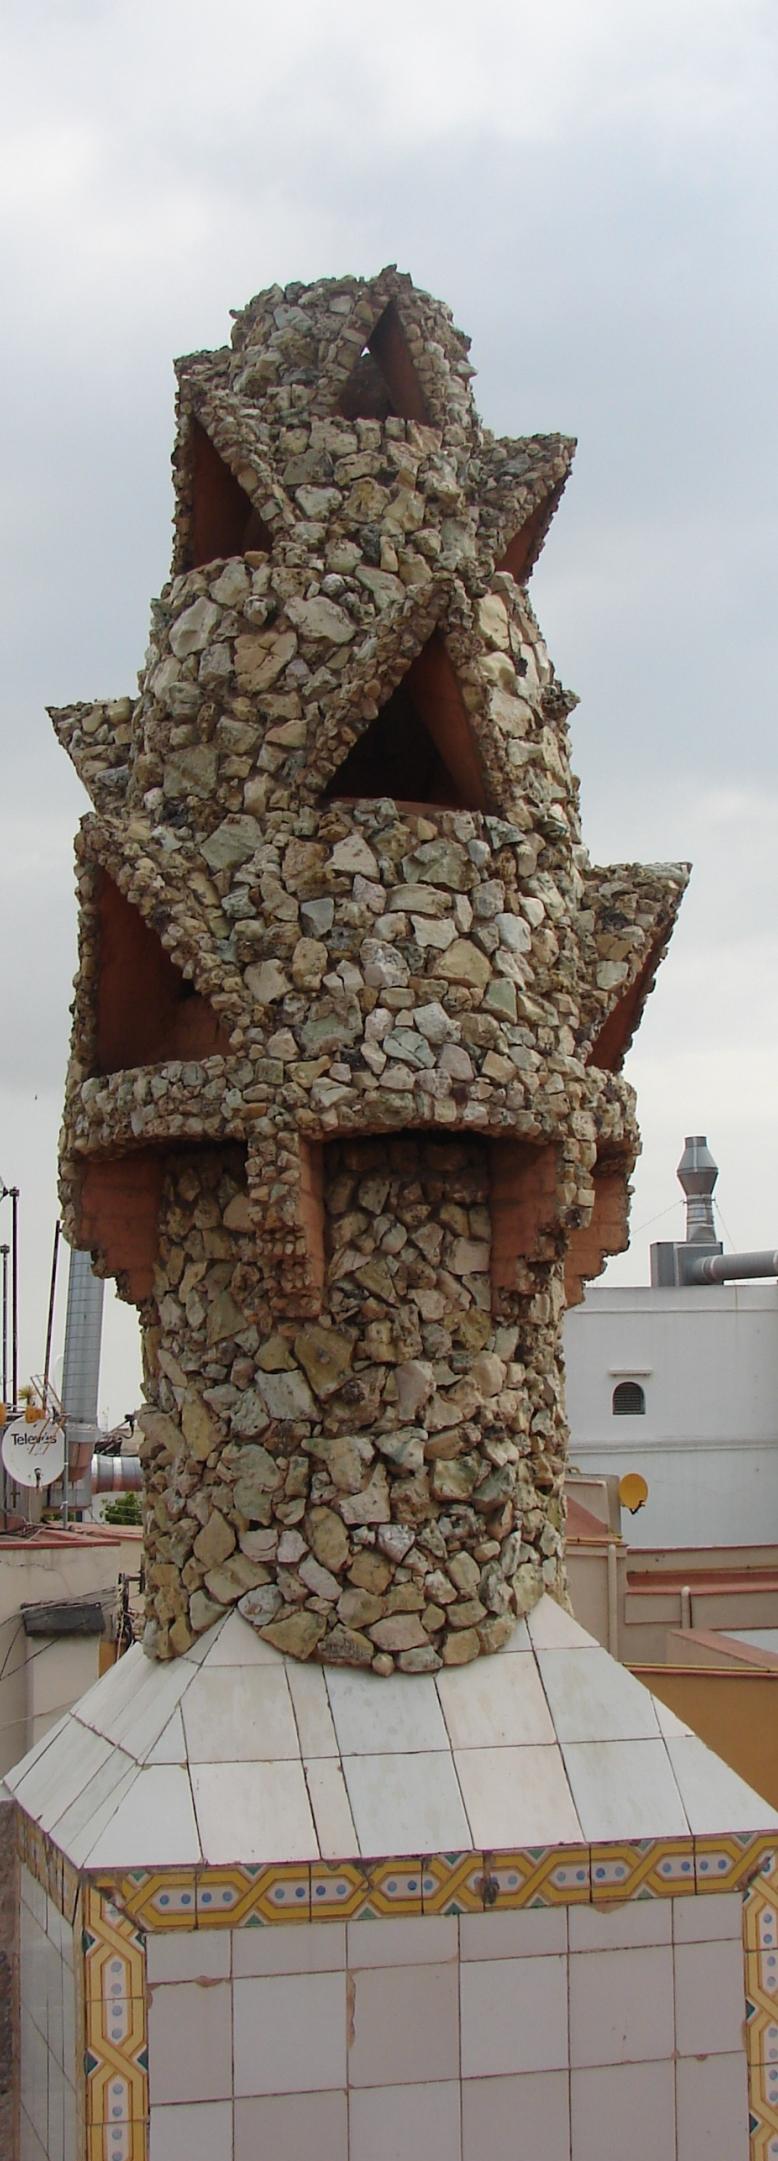 Palau Guell - Chimney [Tall] 7